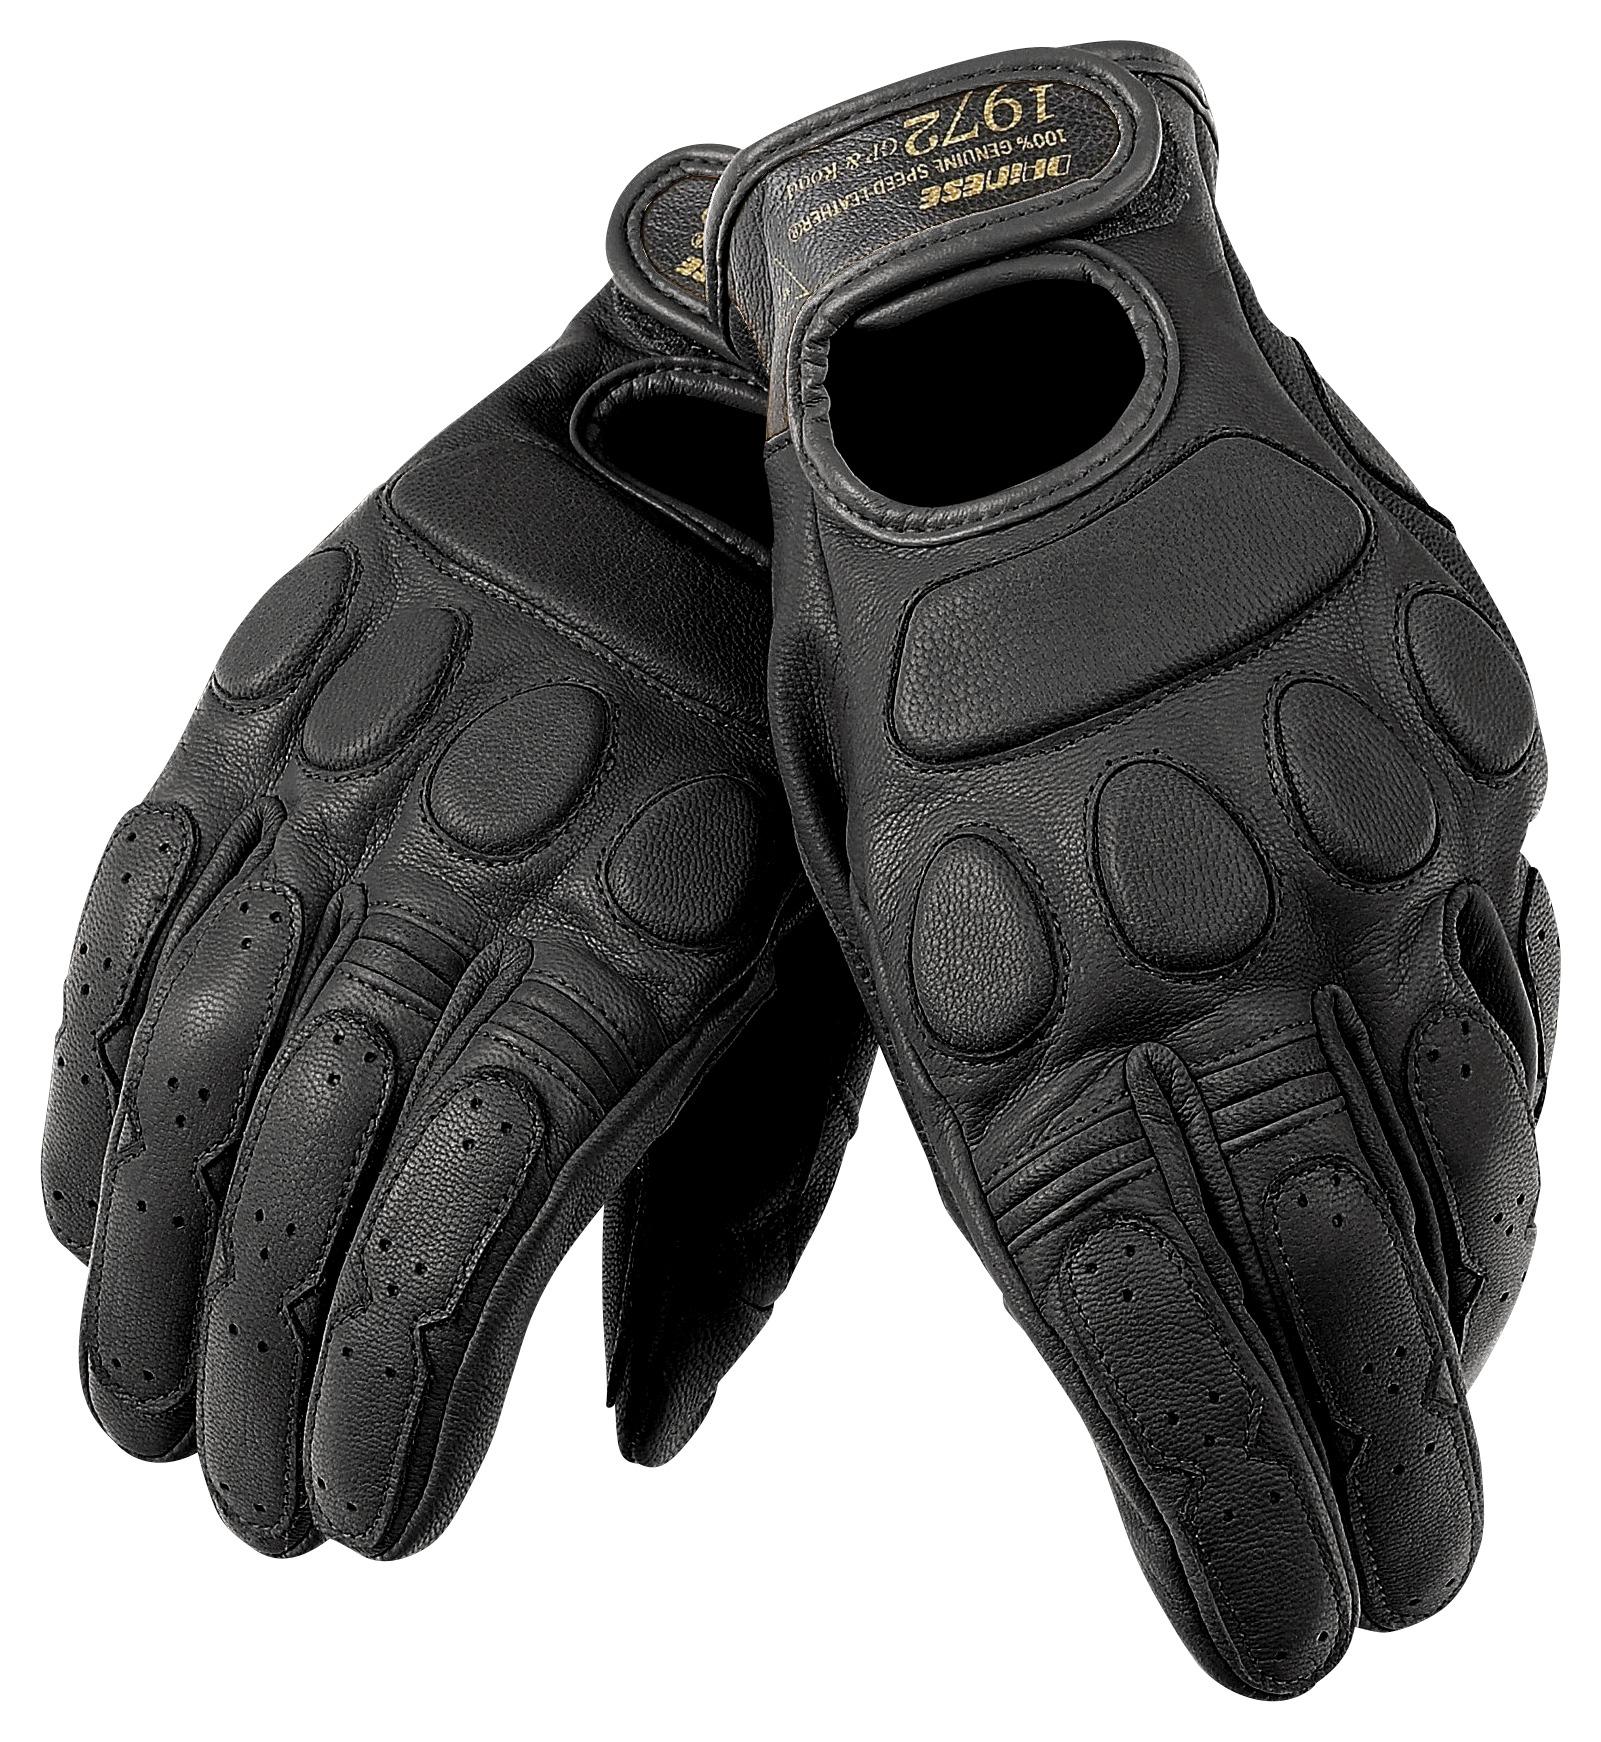 Dainese Blackjack Gloves - RevZilla